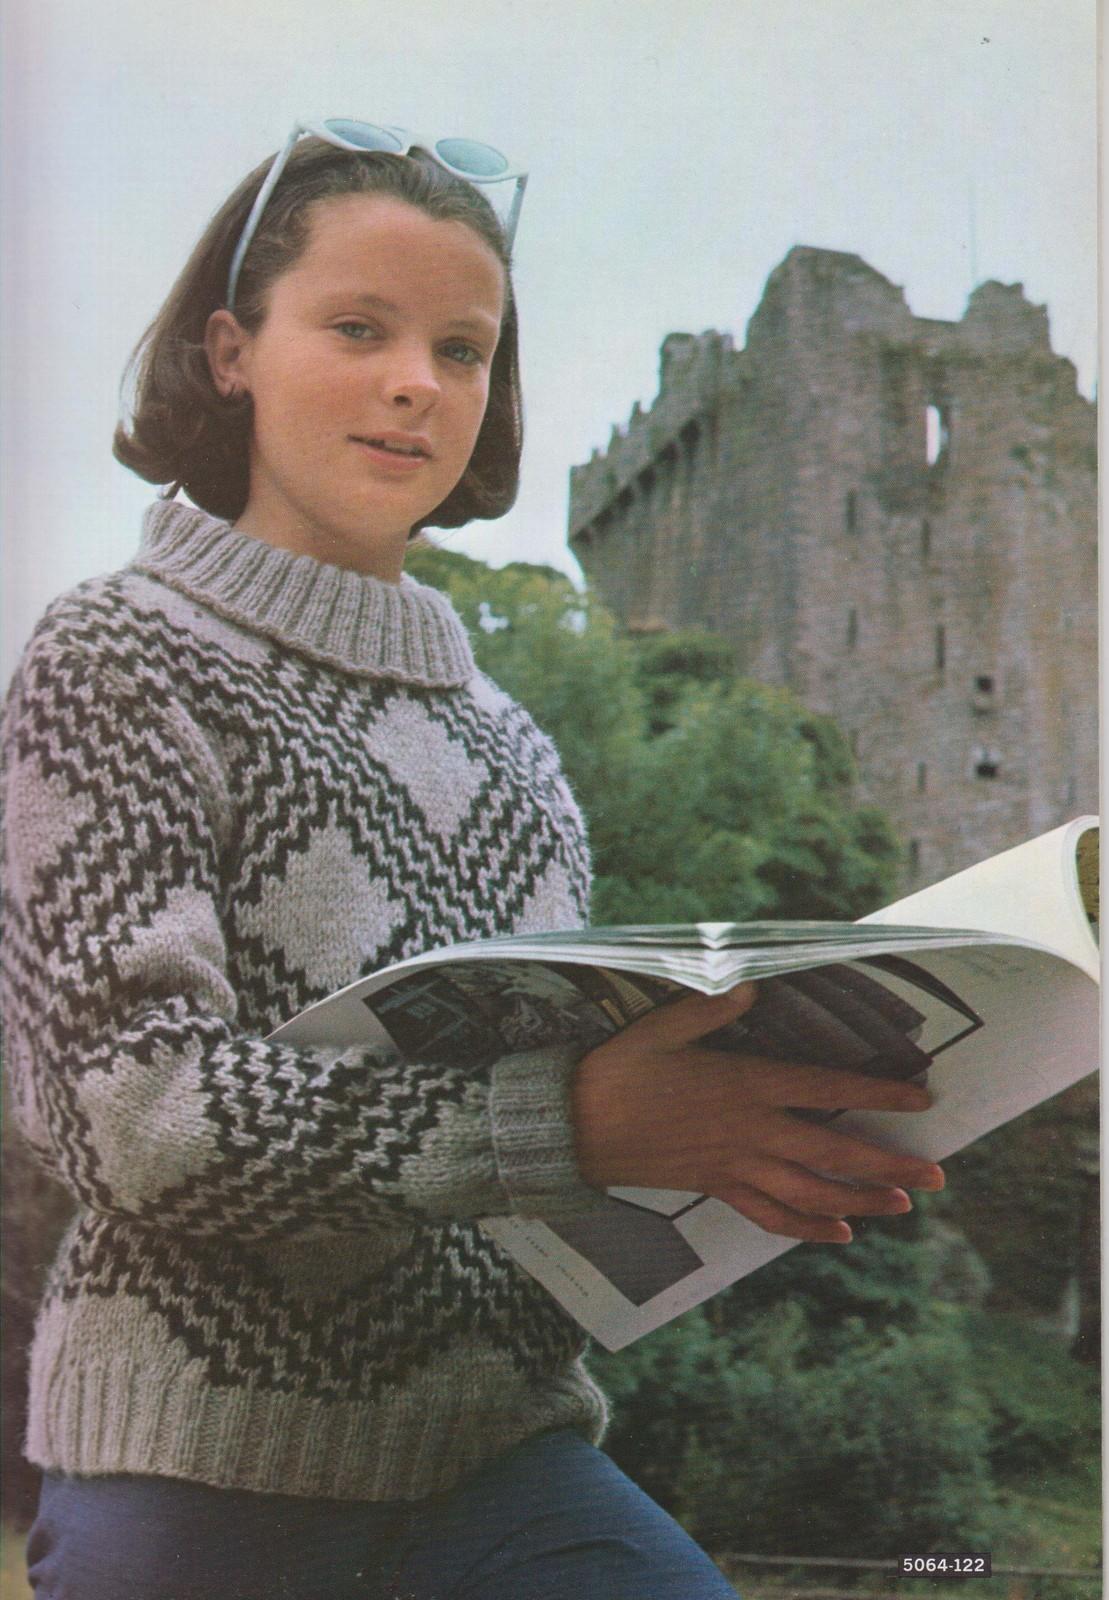 Bernat 1964 Knitting Pattern Book Brawny and 50 similar items